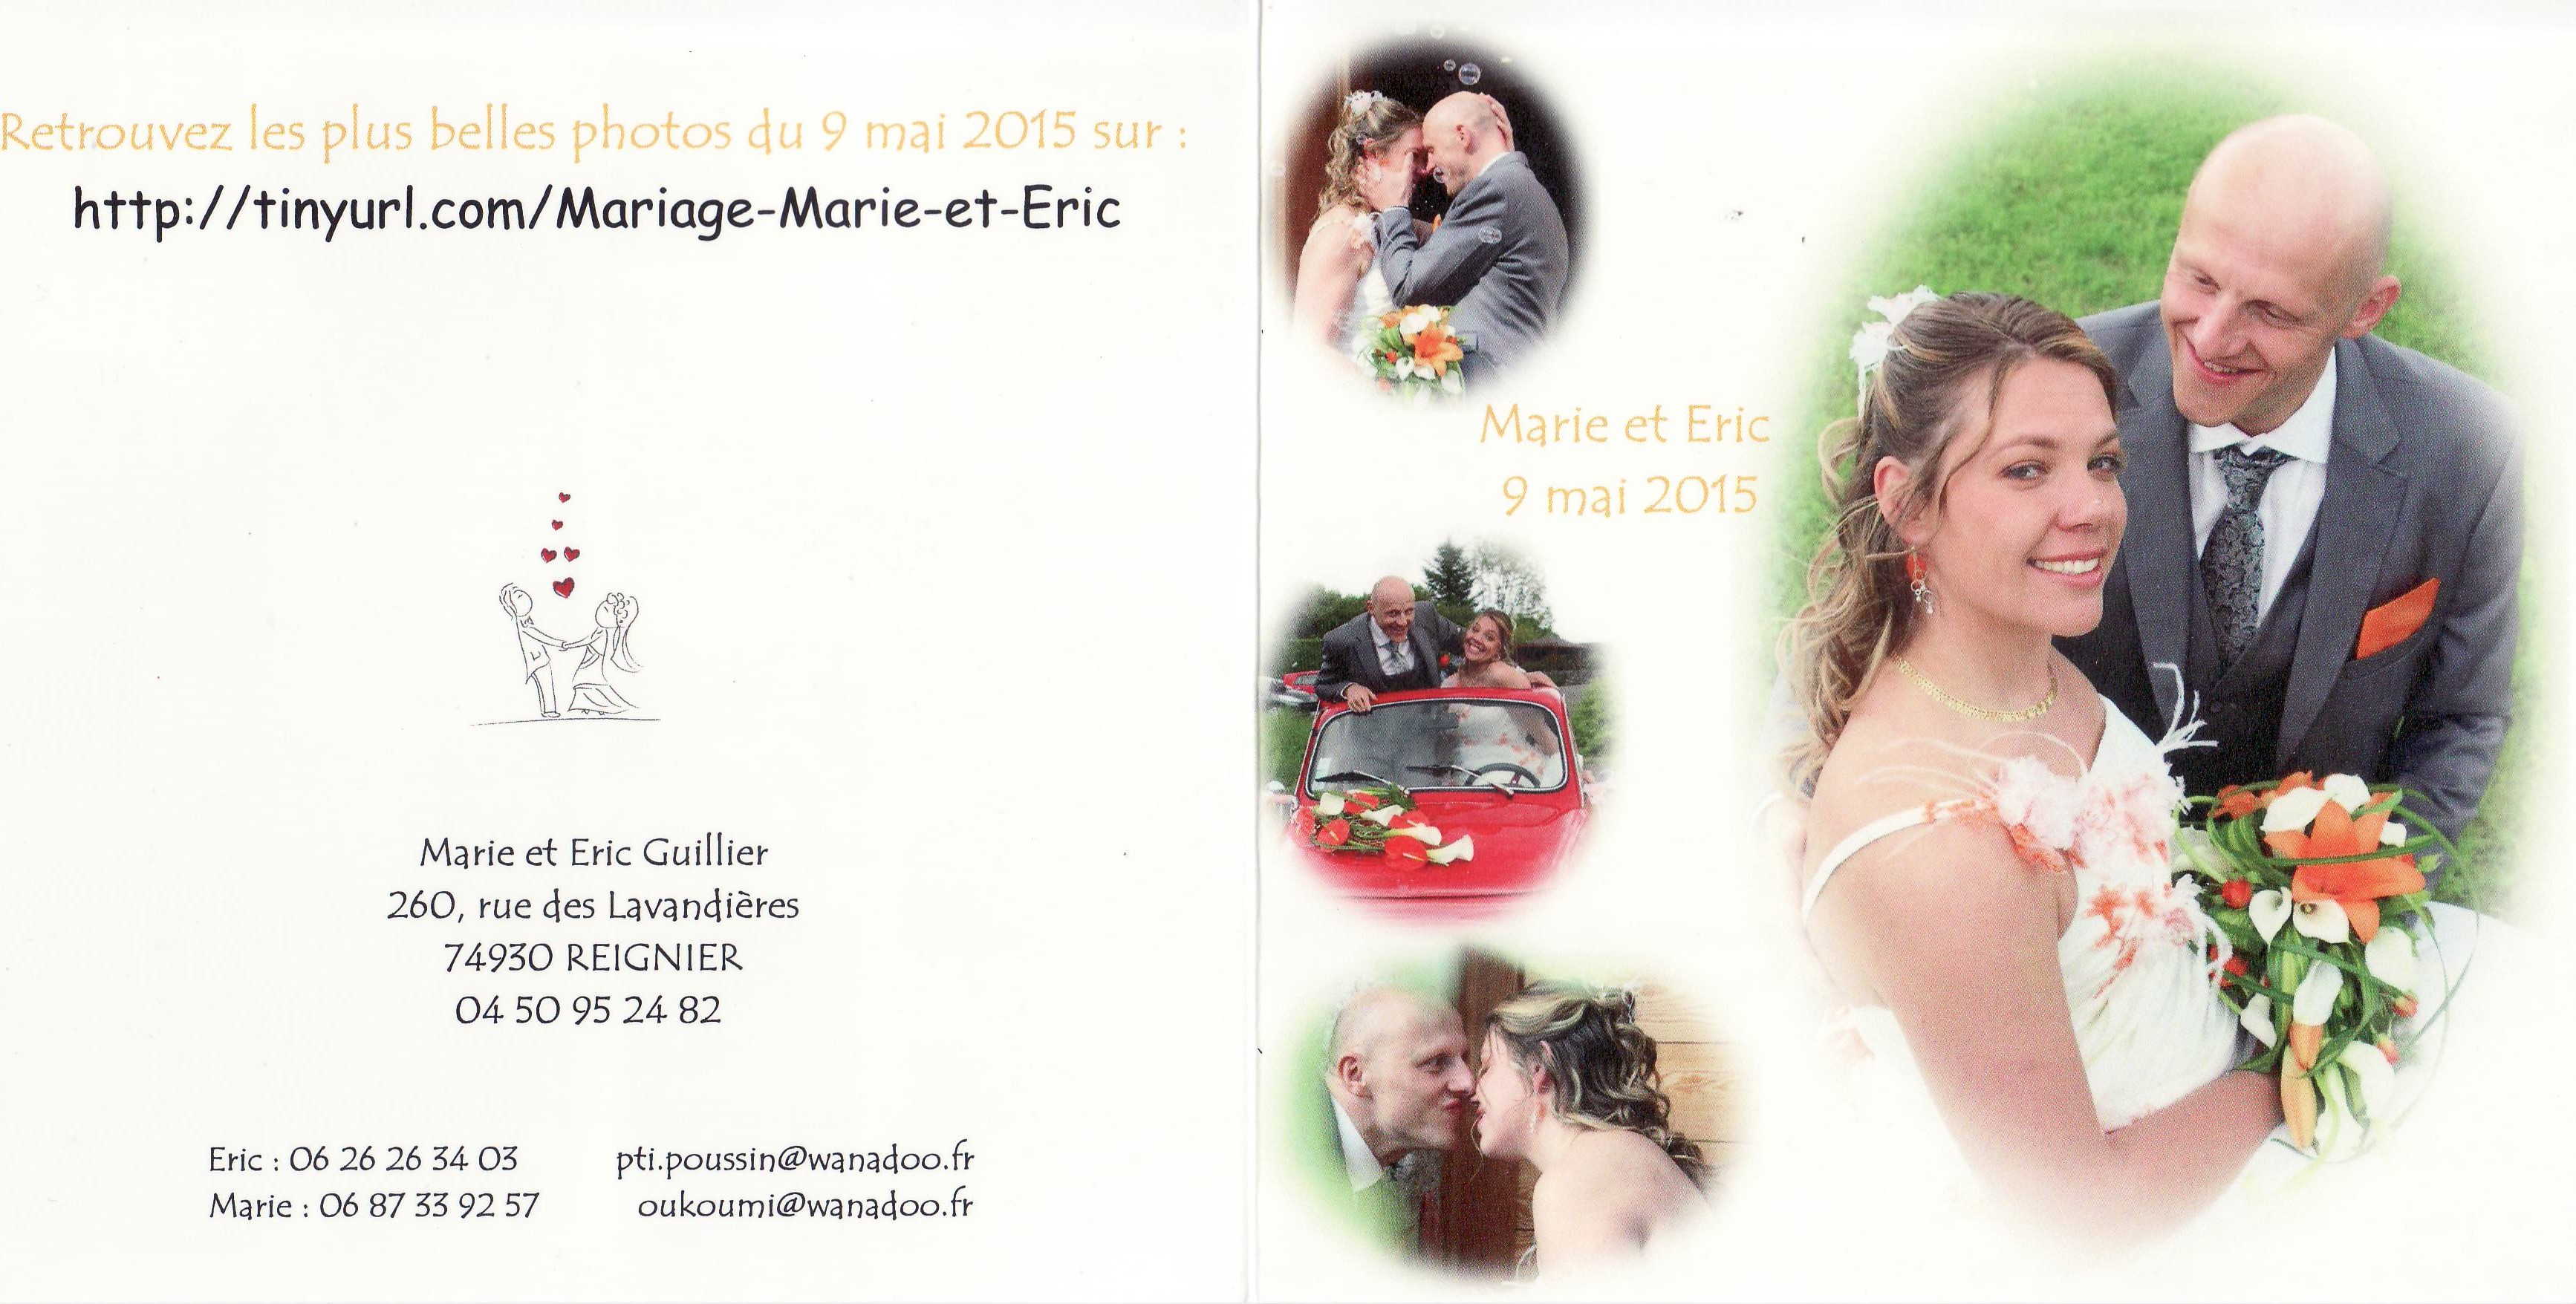 Mariage_GUILLIER_Eric_&_Marie_(Vétraz-Monthoux)_(09-05-2015)_1.JPG